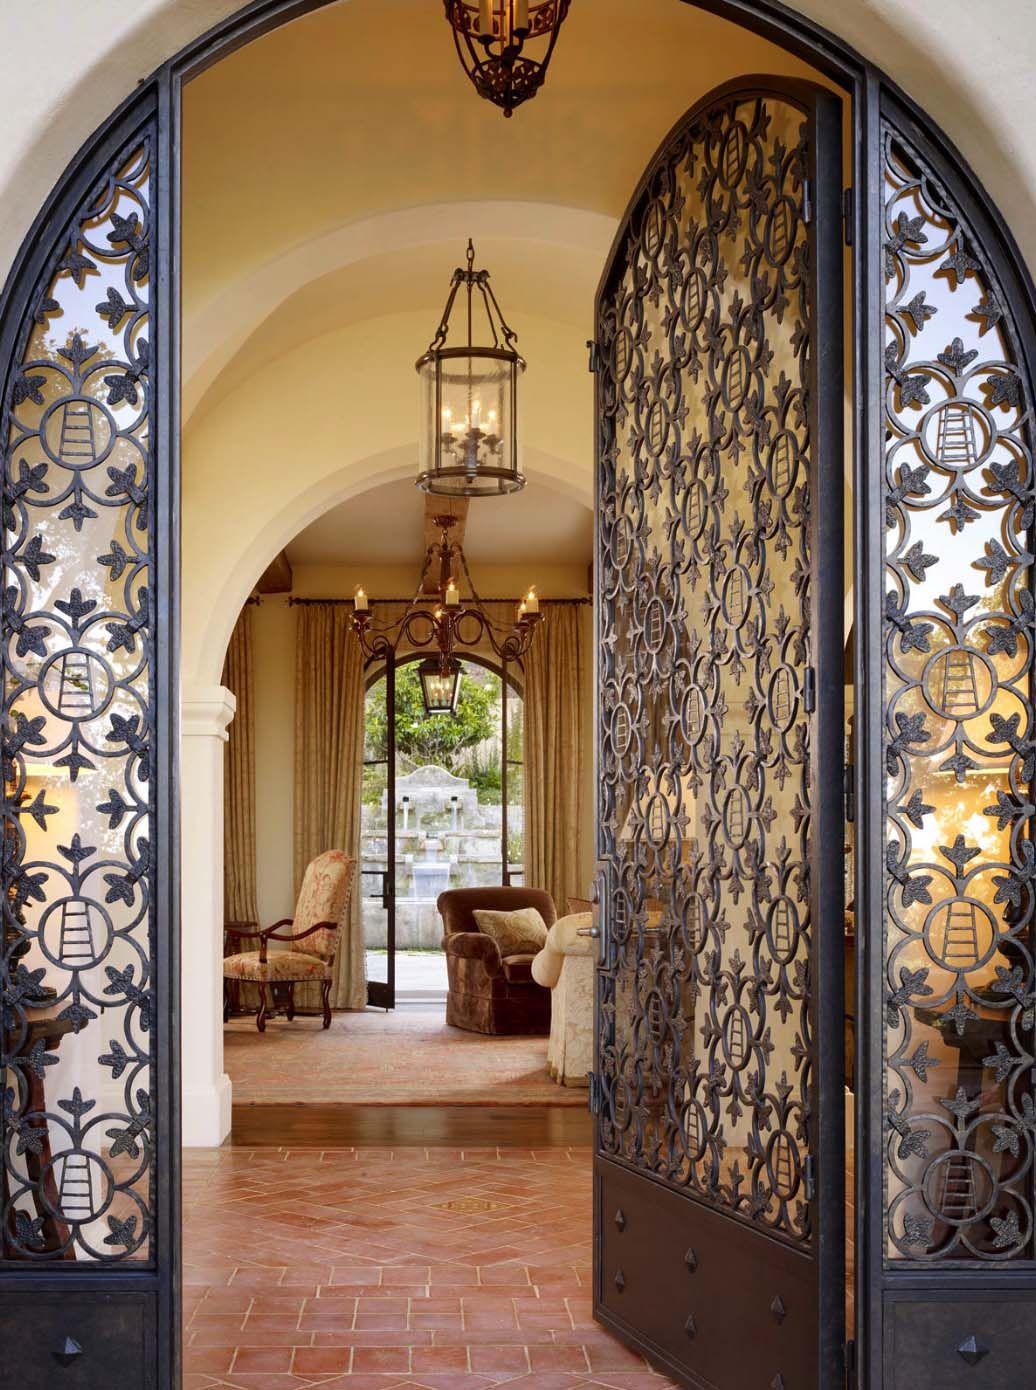 Alu Design Vaison La Romaine spanish-style hacienda in carmel valley showcases inviting